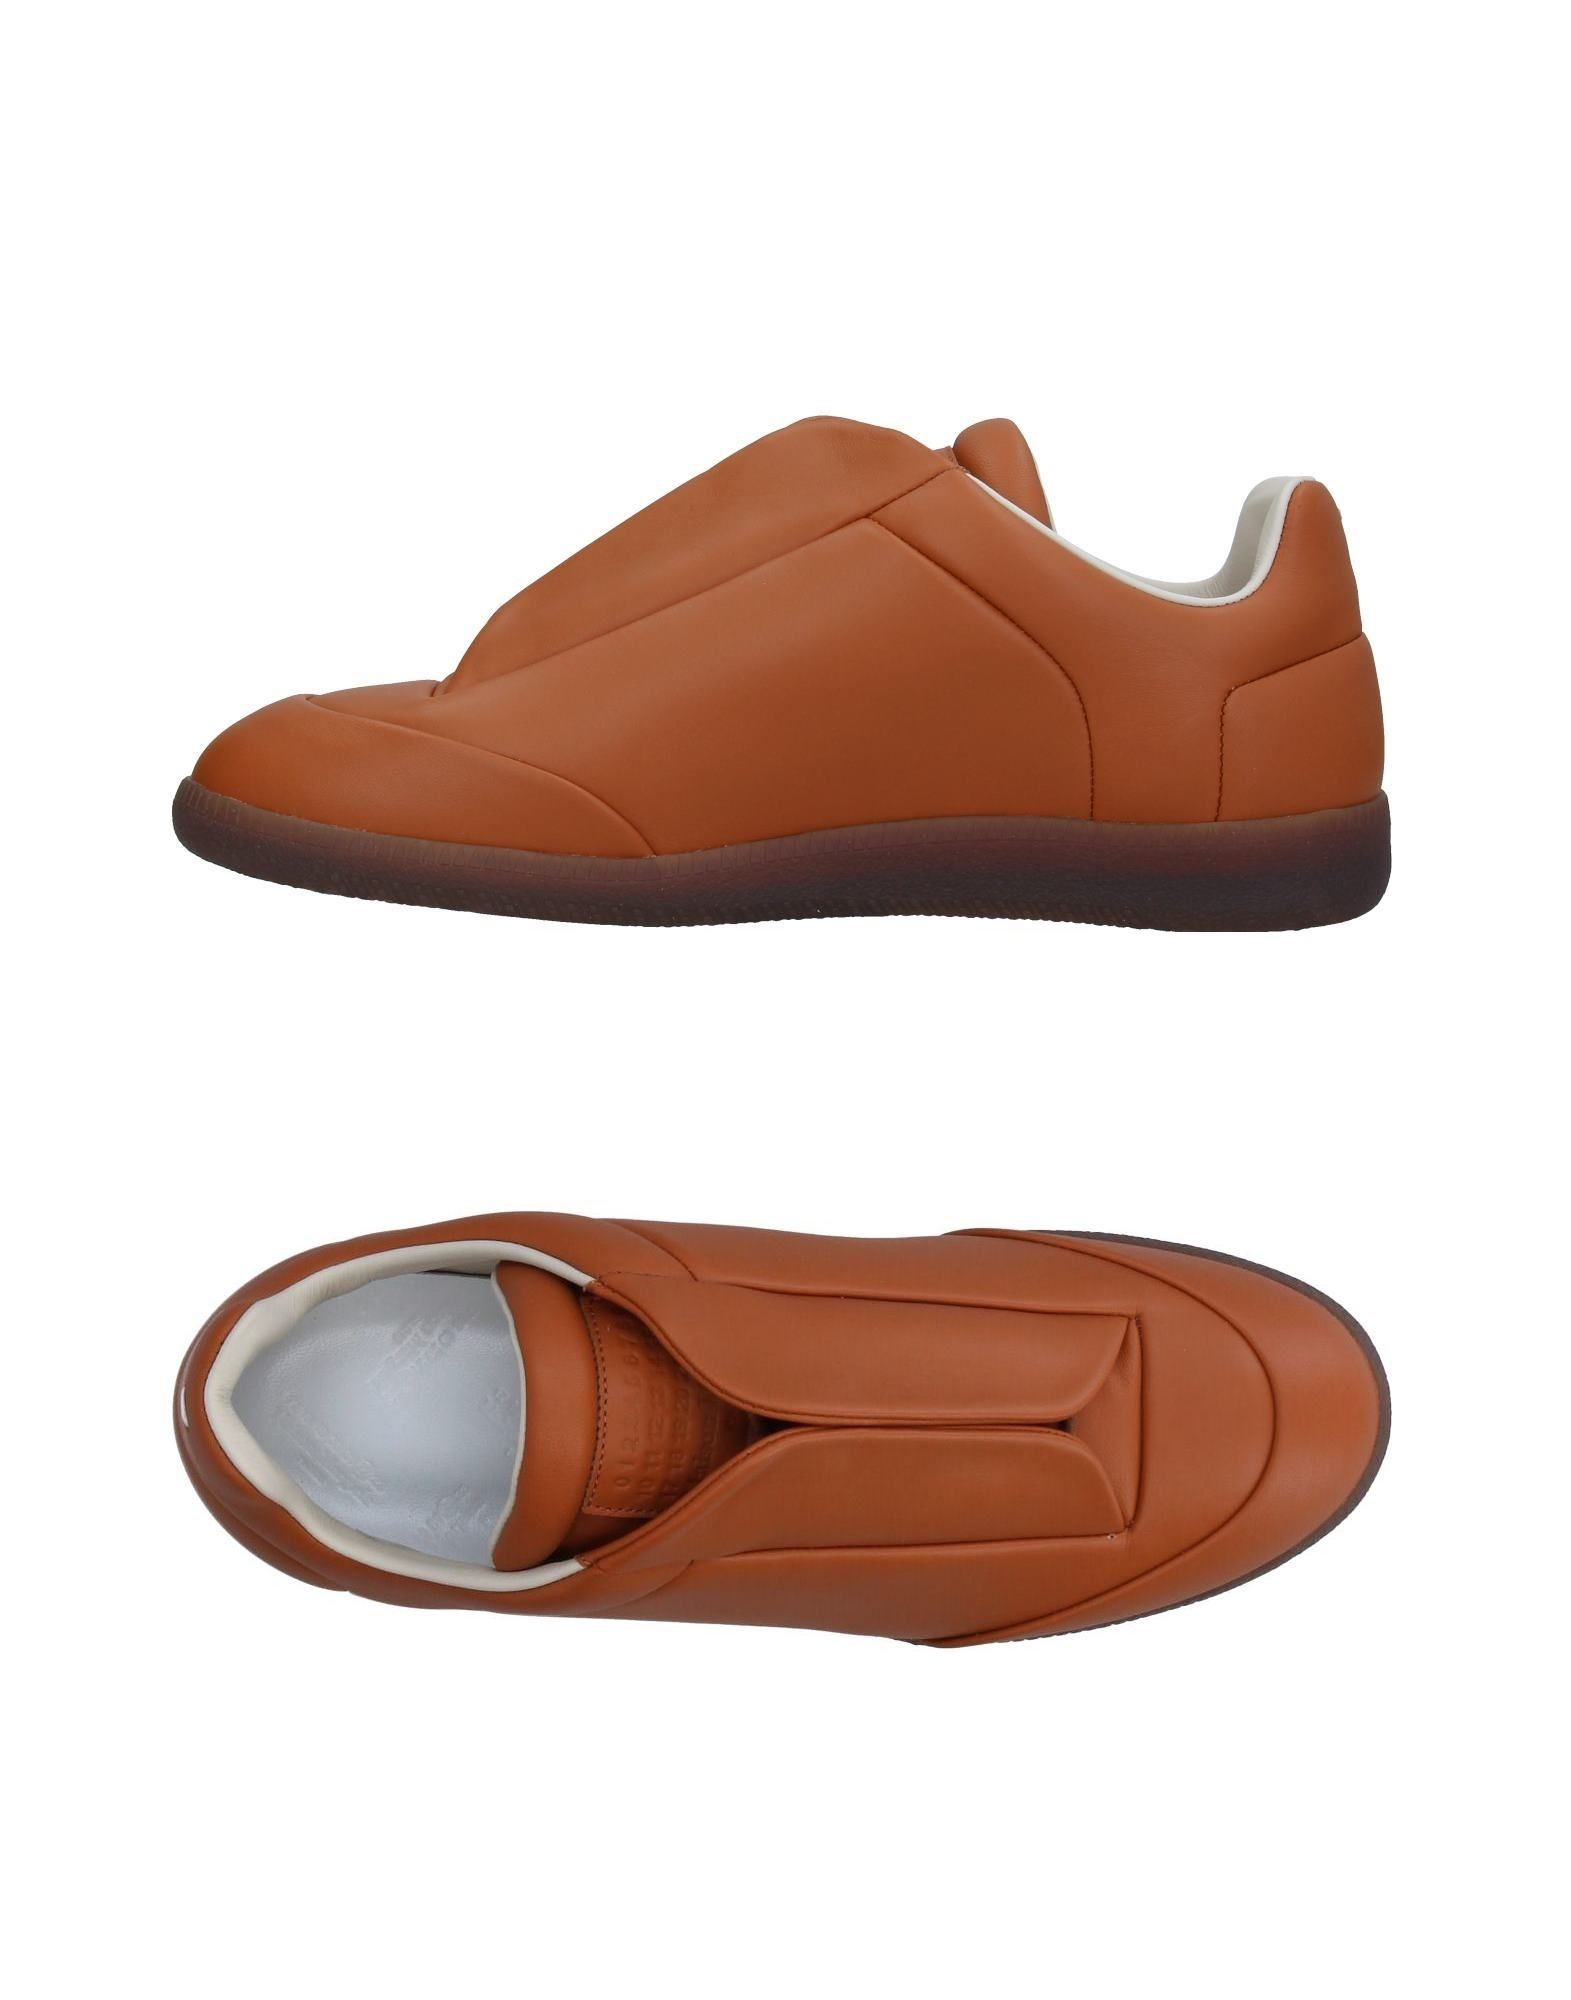 Maison Margiela Sneakers Herren  11351451QD Gute Qualität beliebte Schuhe